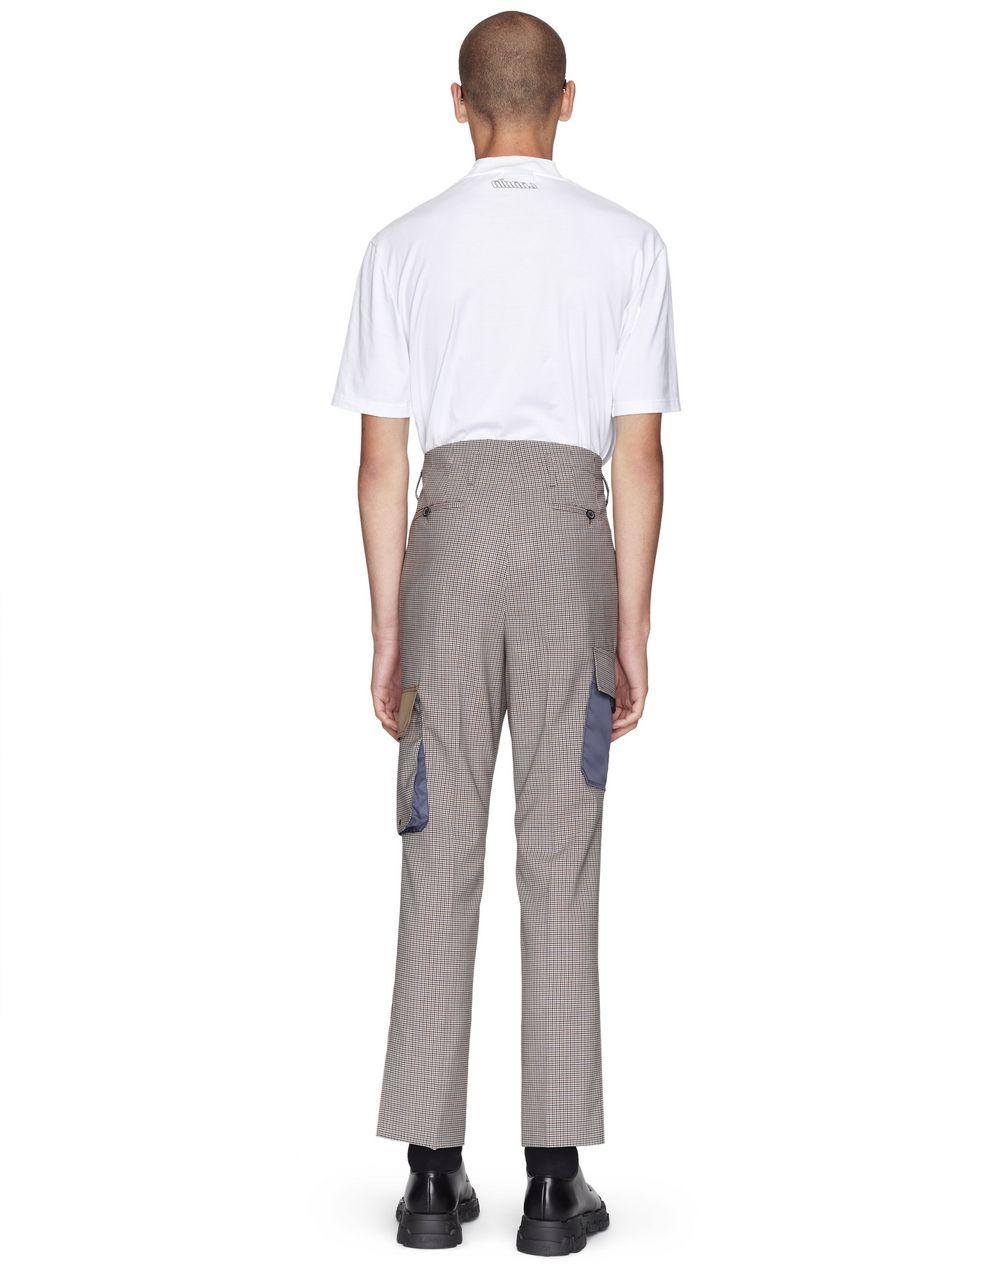 MULTICOLORED CHECKERED STRAIGHT-LEG PANTS - Lanvin